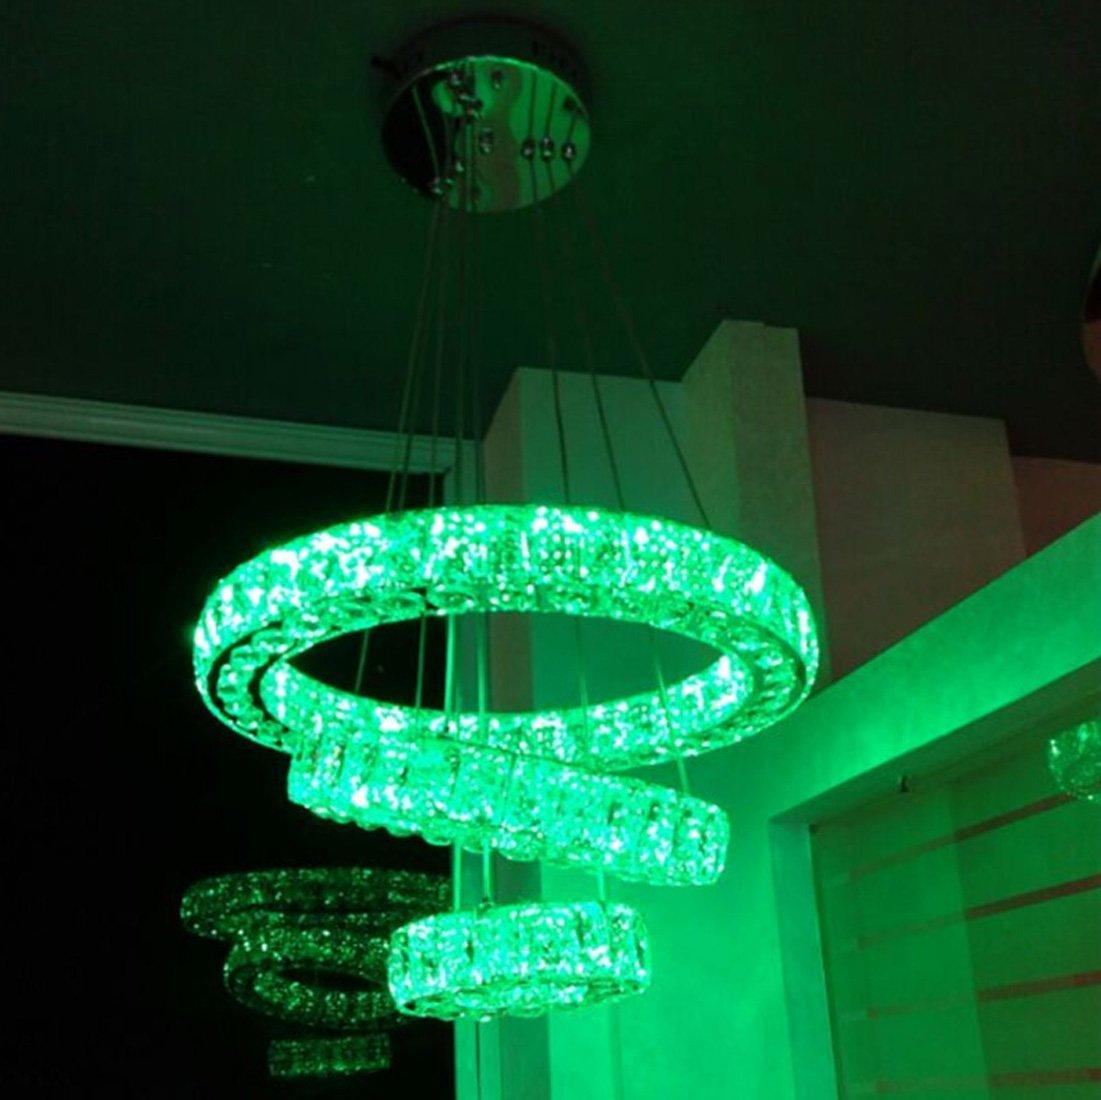 Ydxwan LED RGB DiscoloROT geformt Kristall Kronleuchter, Edelstahl, dimmbar, moderne moderne Wohnzimmer Kristall Kronleuchter, Kronleuchter